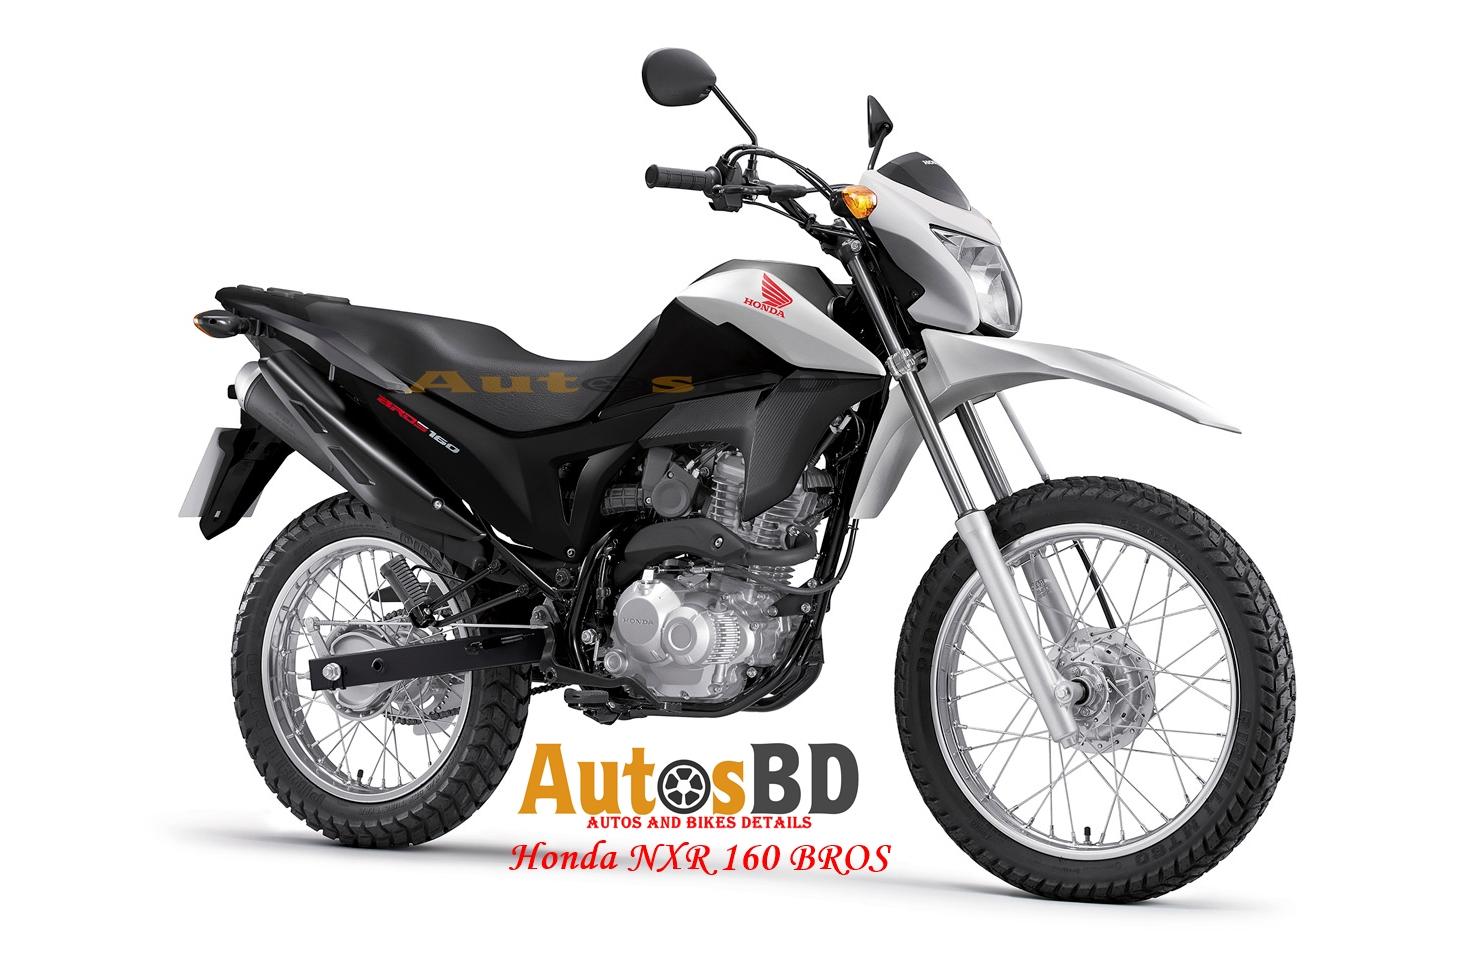 Honda NXR 160 BROS Motorcycle Specification